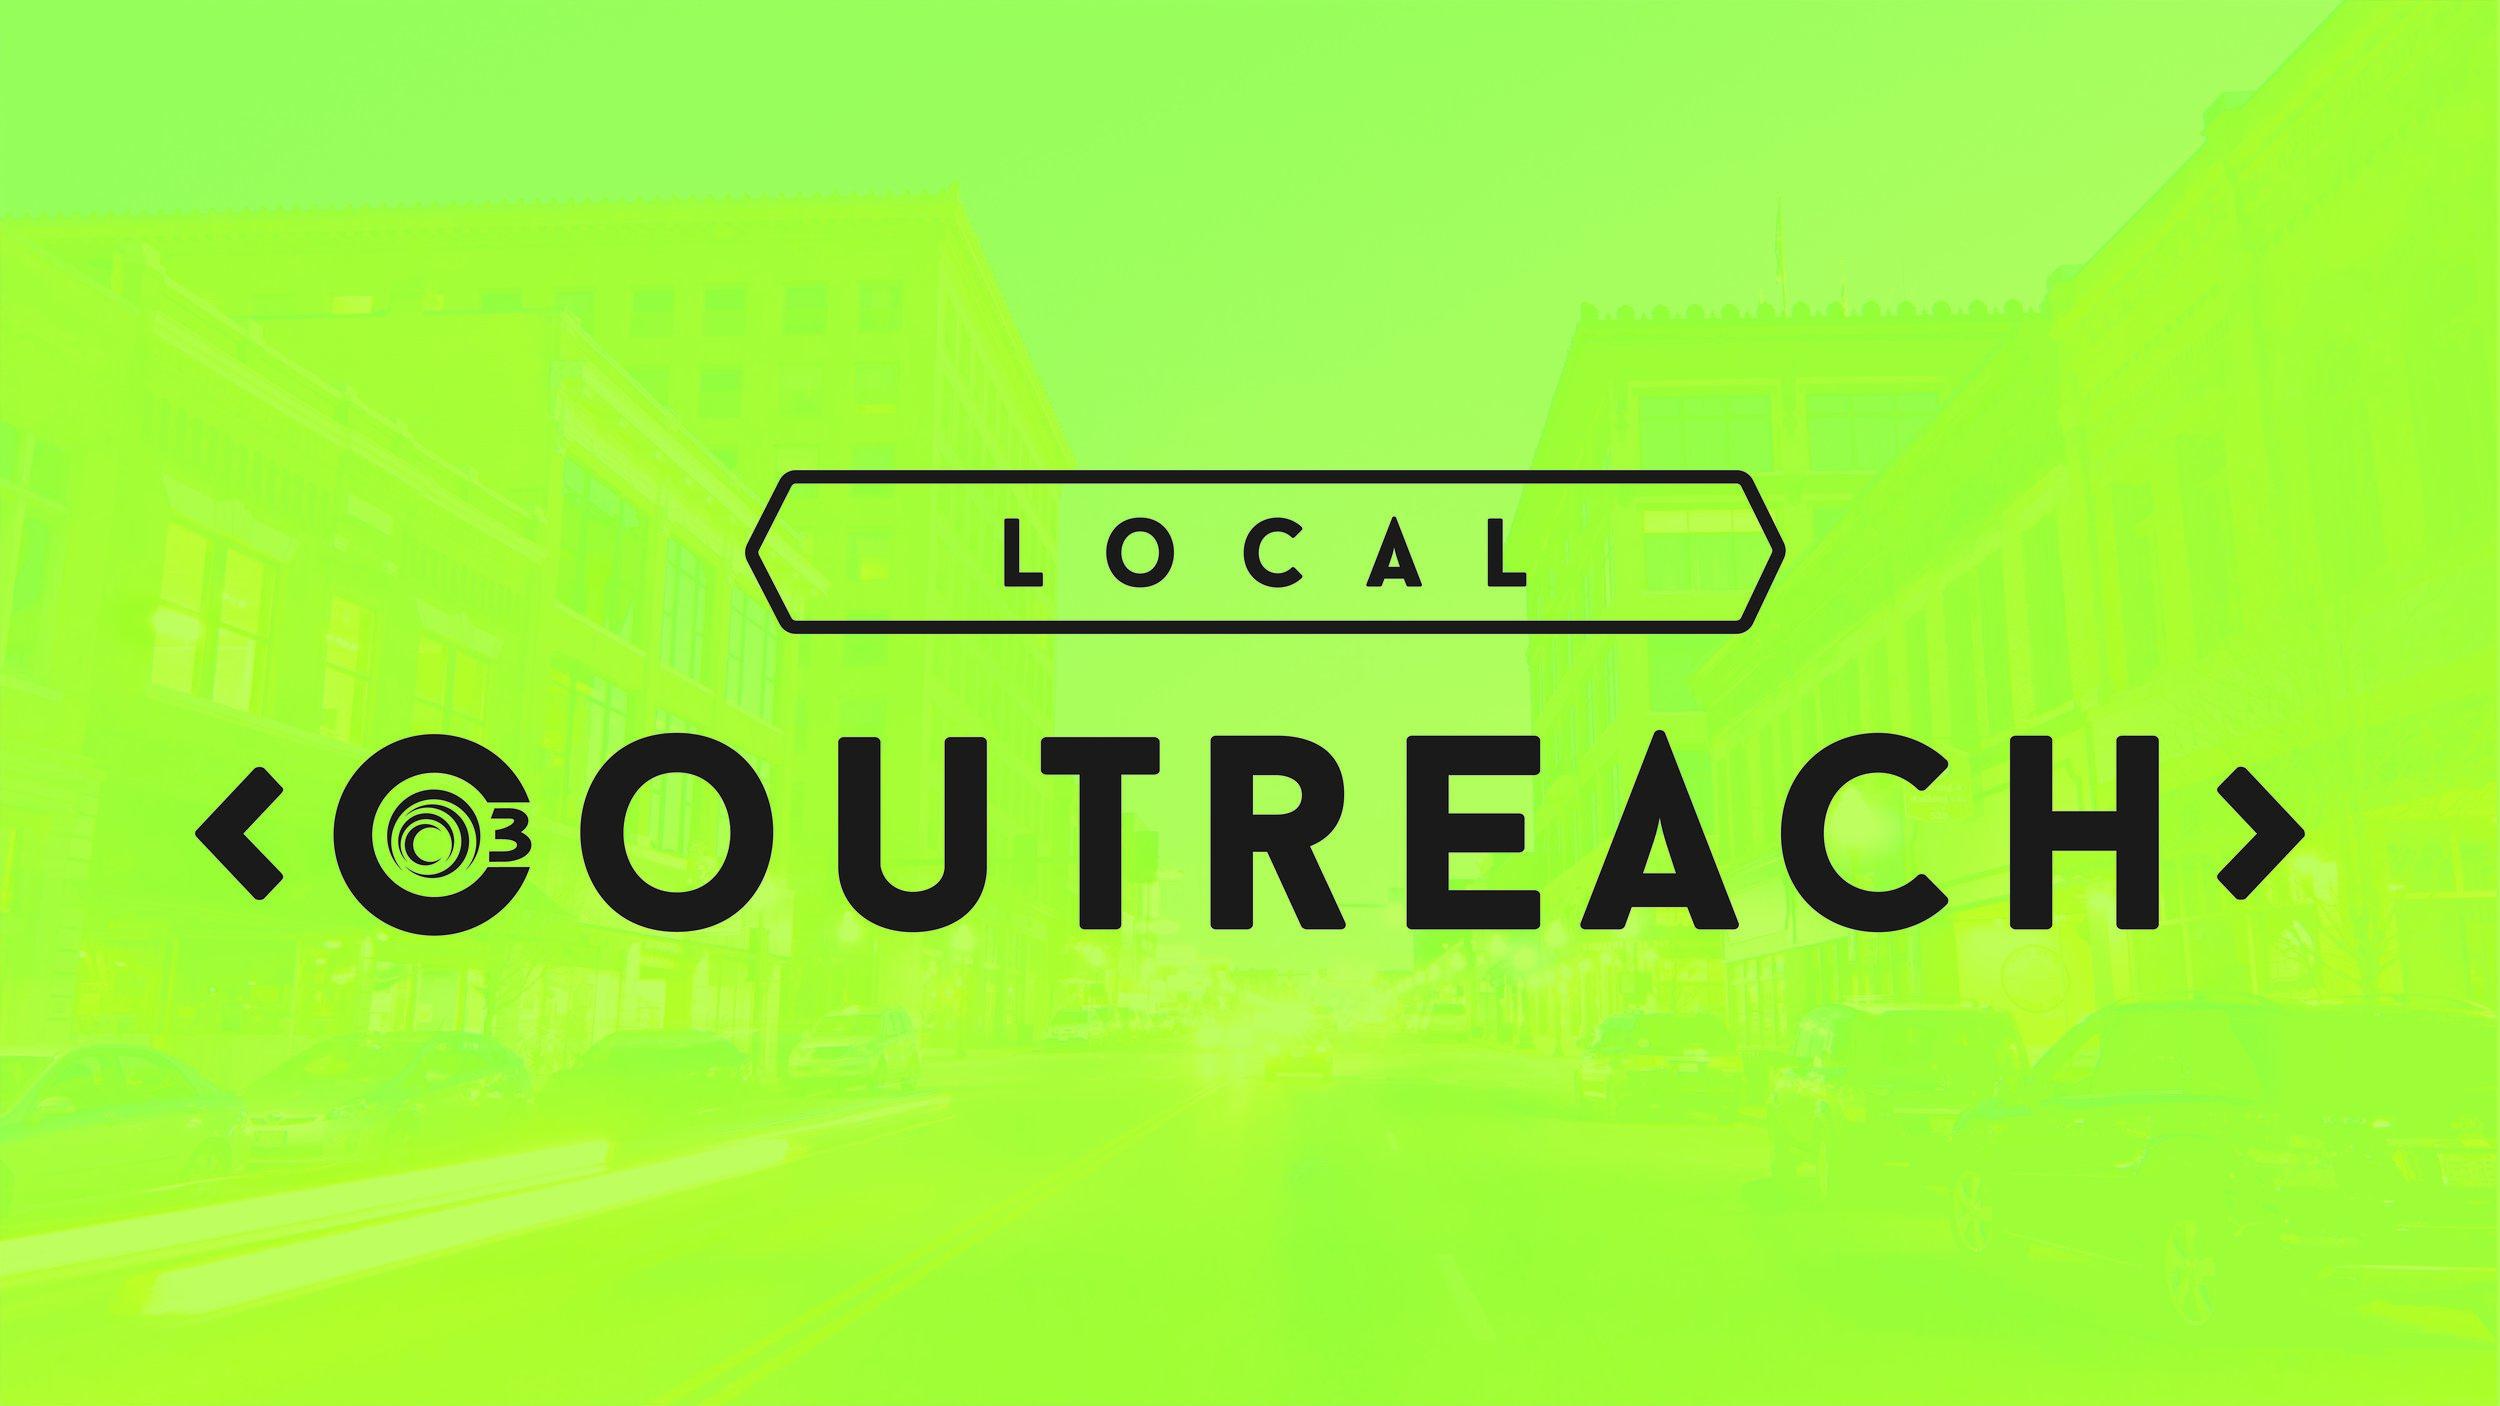 LocalOutreach_Image.jpg